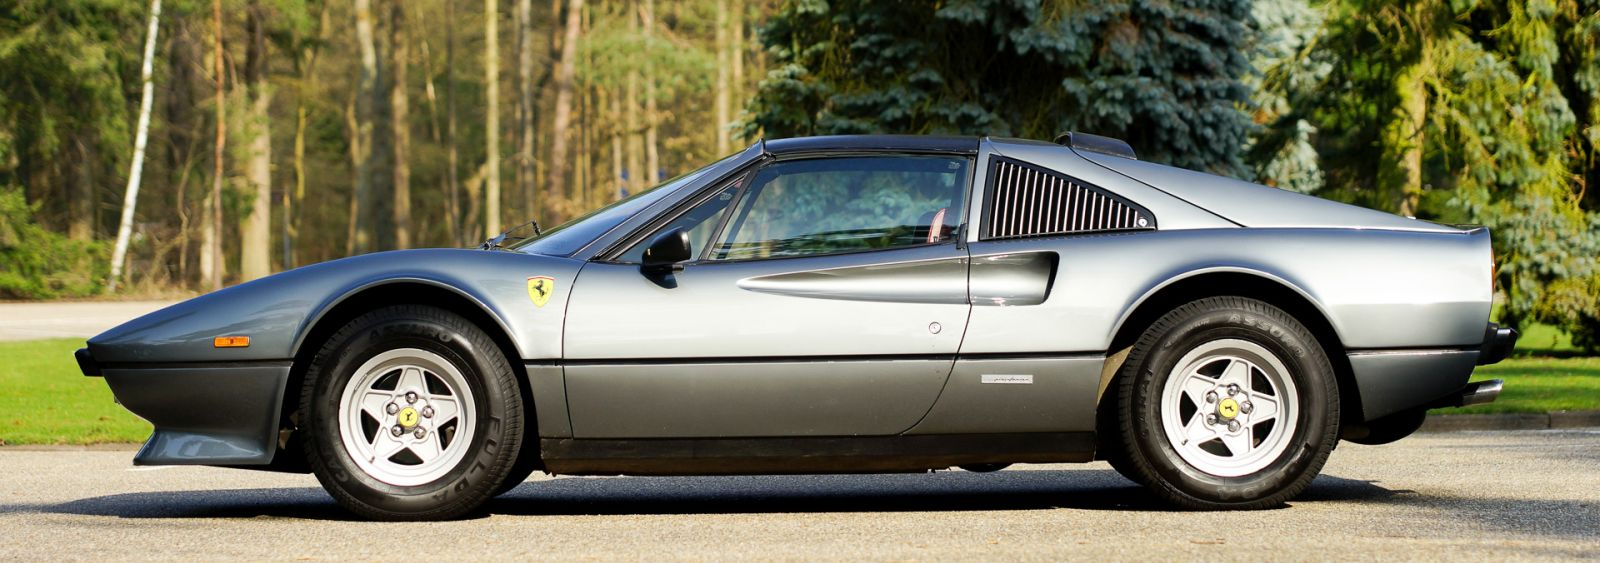 Ferrari 308 Gts Quattrovalvole 1984 Classicargarage De